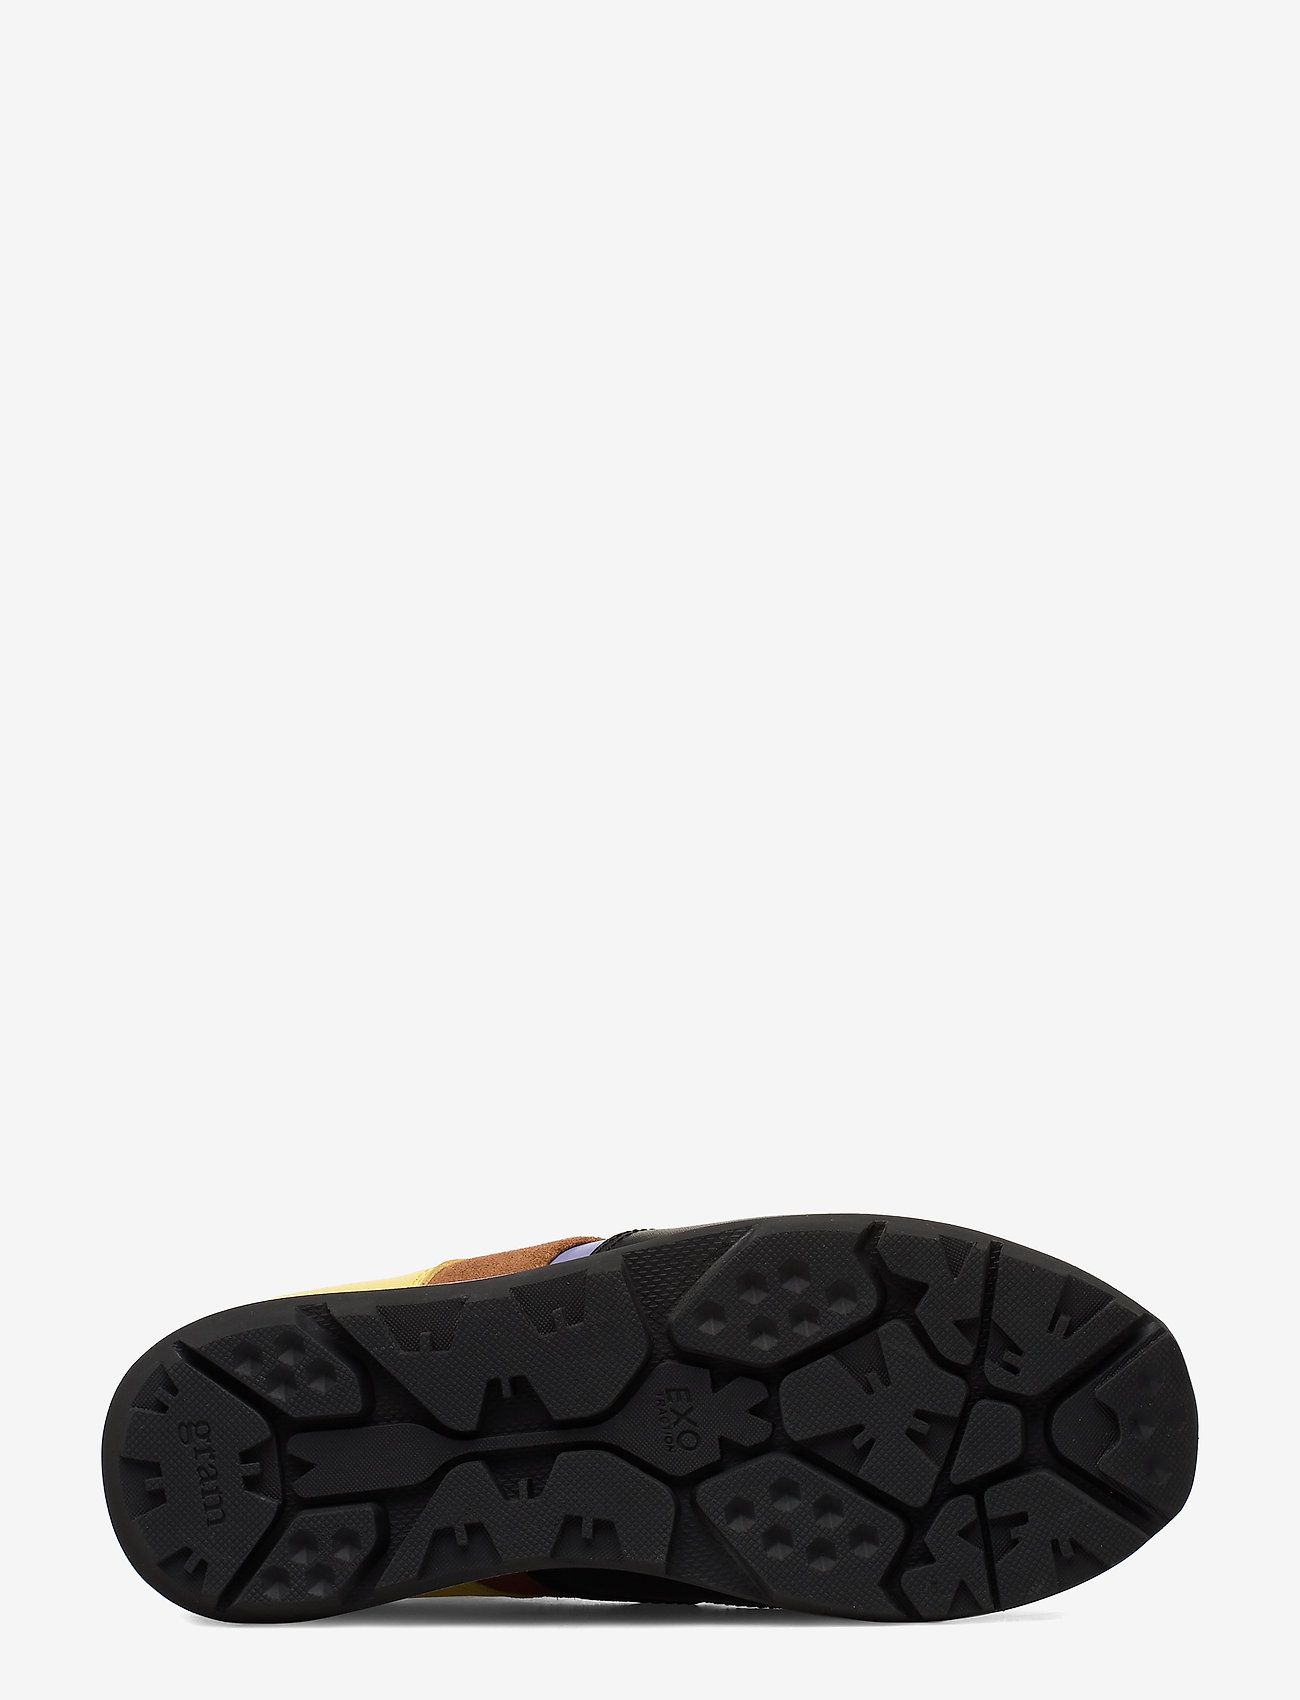 Gram 442g Electric Lavender & Bleached Corn - Sneakers Multi Color